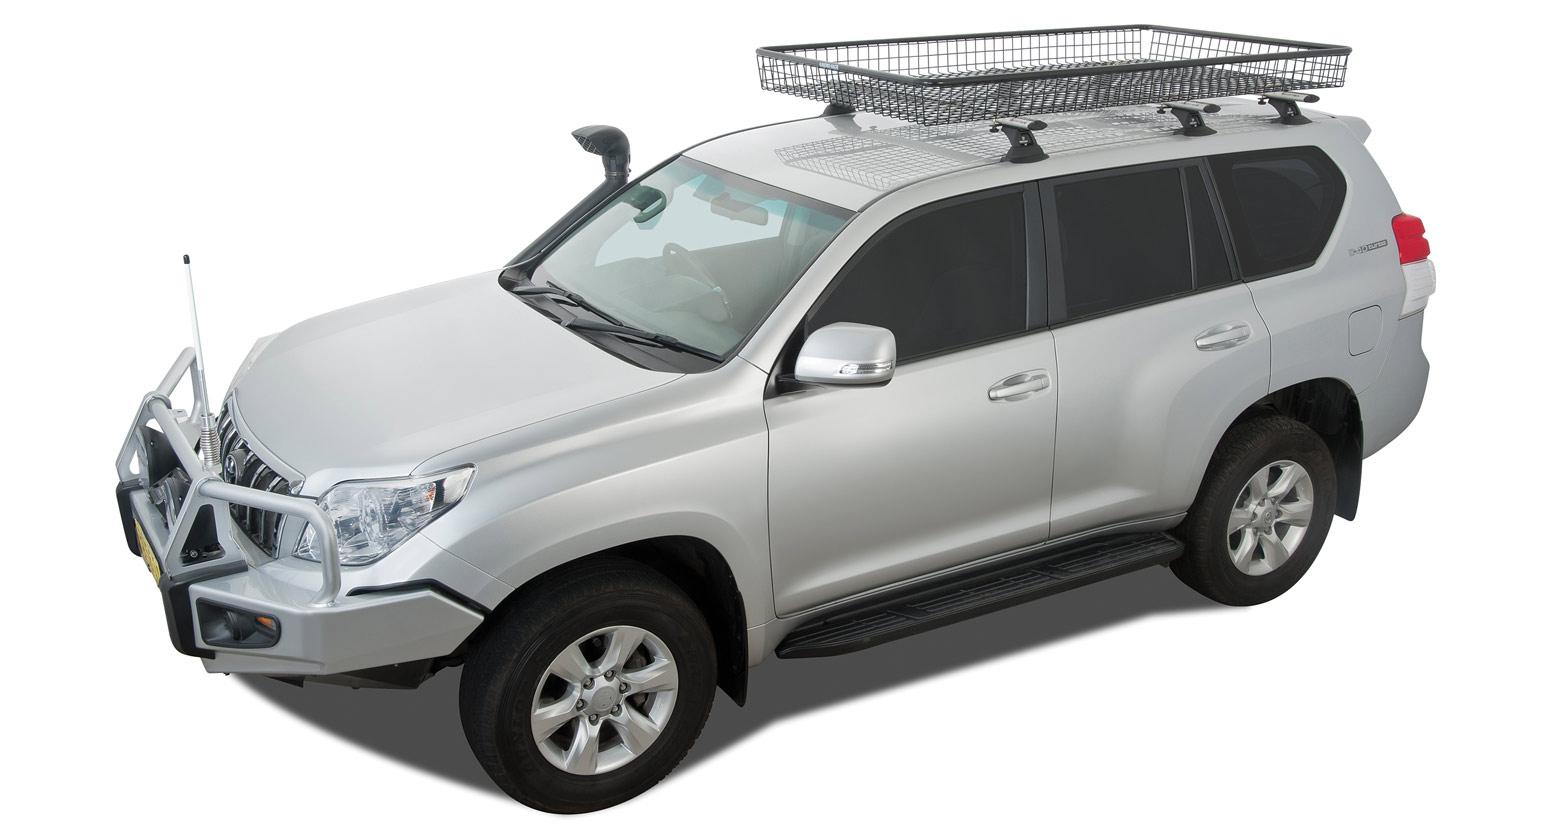 steel mesh basket xxl rlbxxl rhino rack. Black Bedroom Furniture Sets. Home Design Ideas